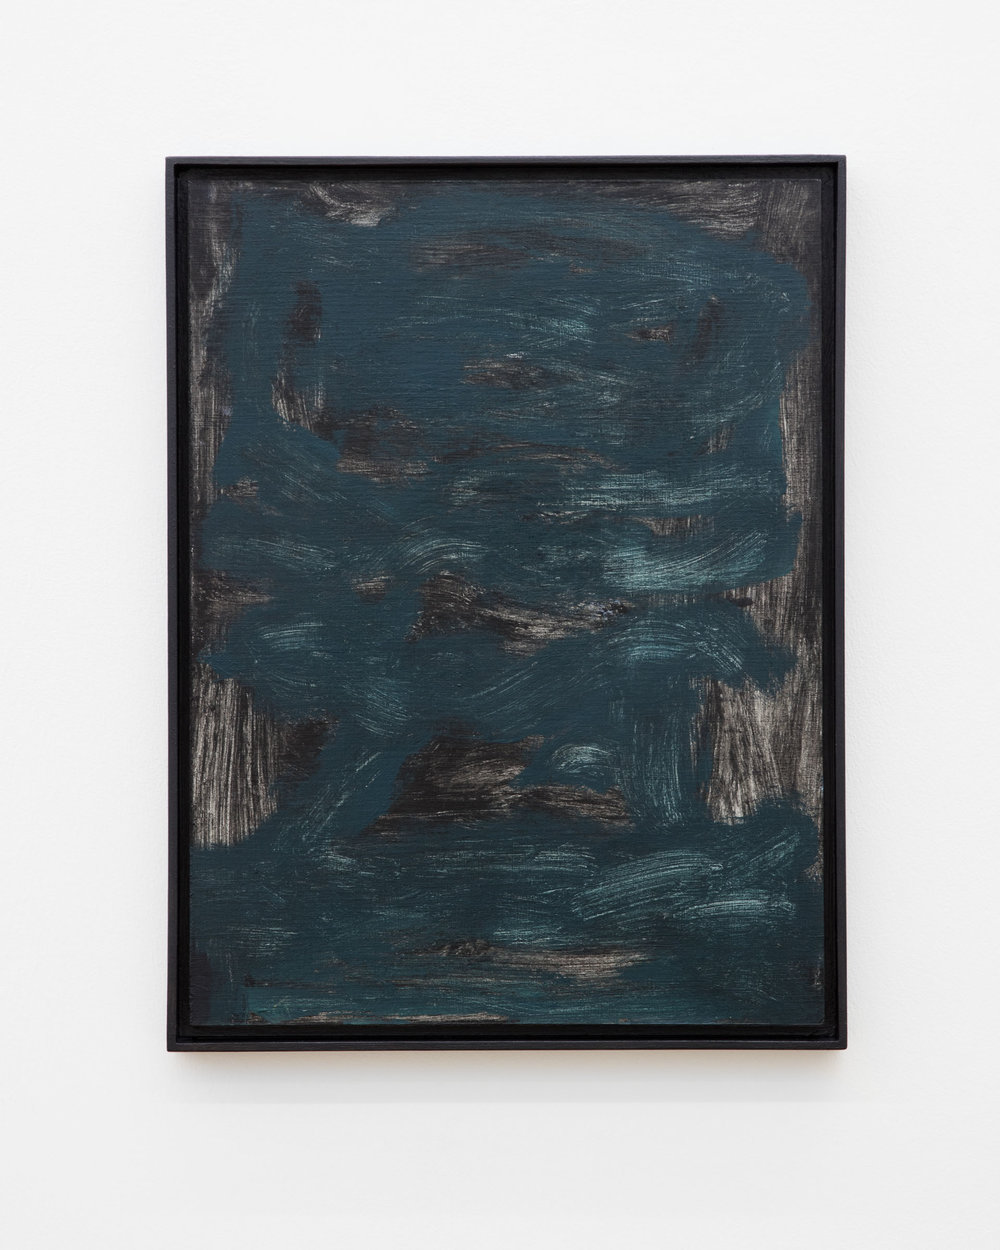 Veronika Hilger: Untitled, 2019, oil on paper on MDF in artists frame, 39,7 x 29,8 cm